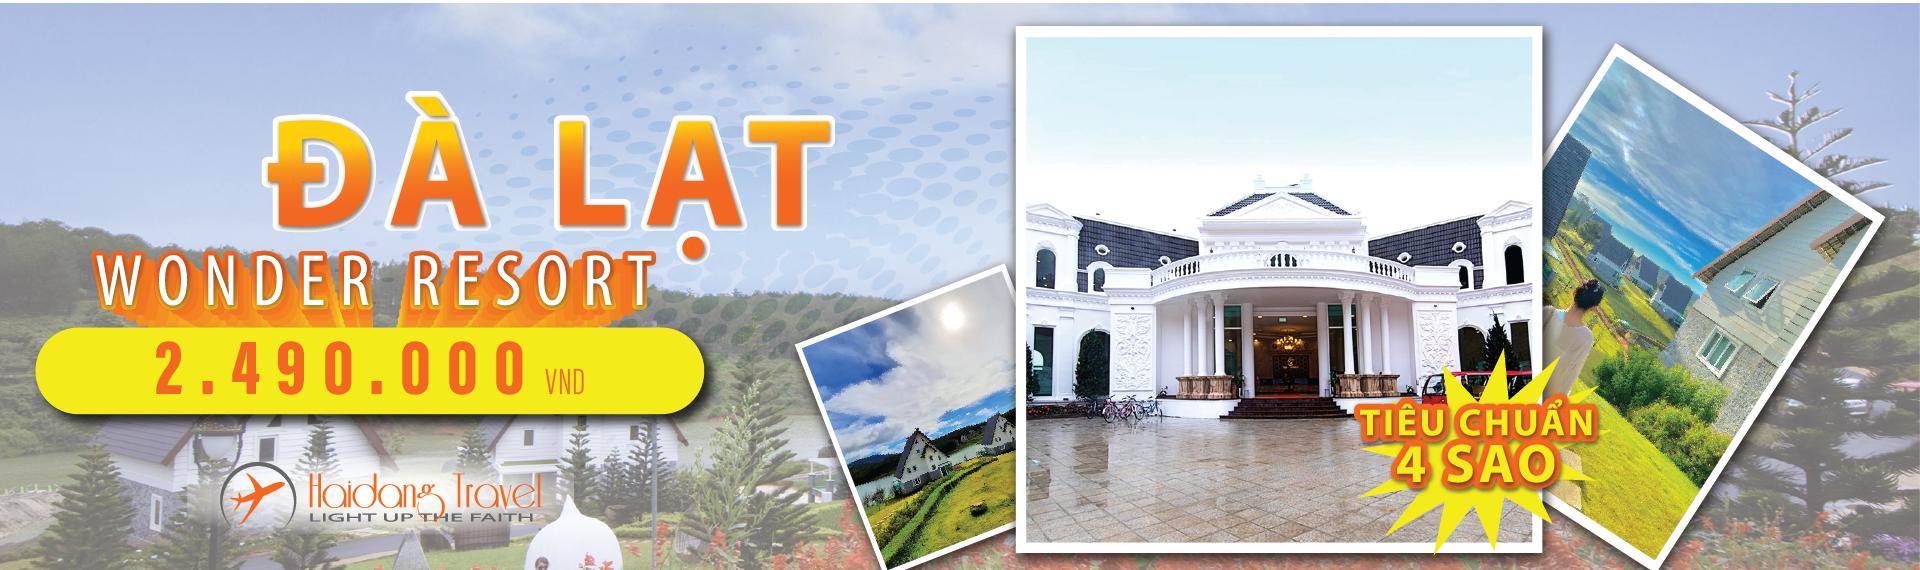 Tour Đà Lạt - wonder resort